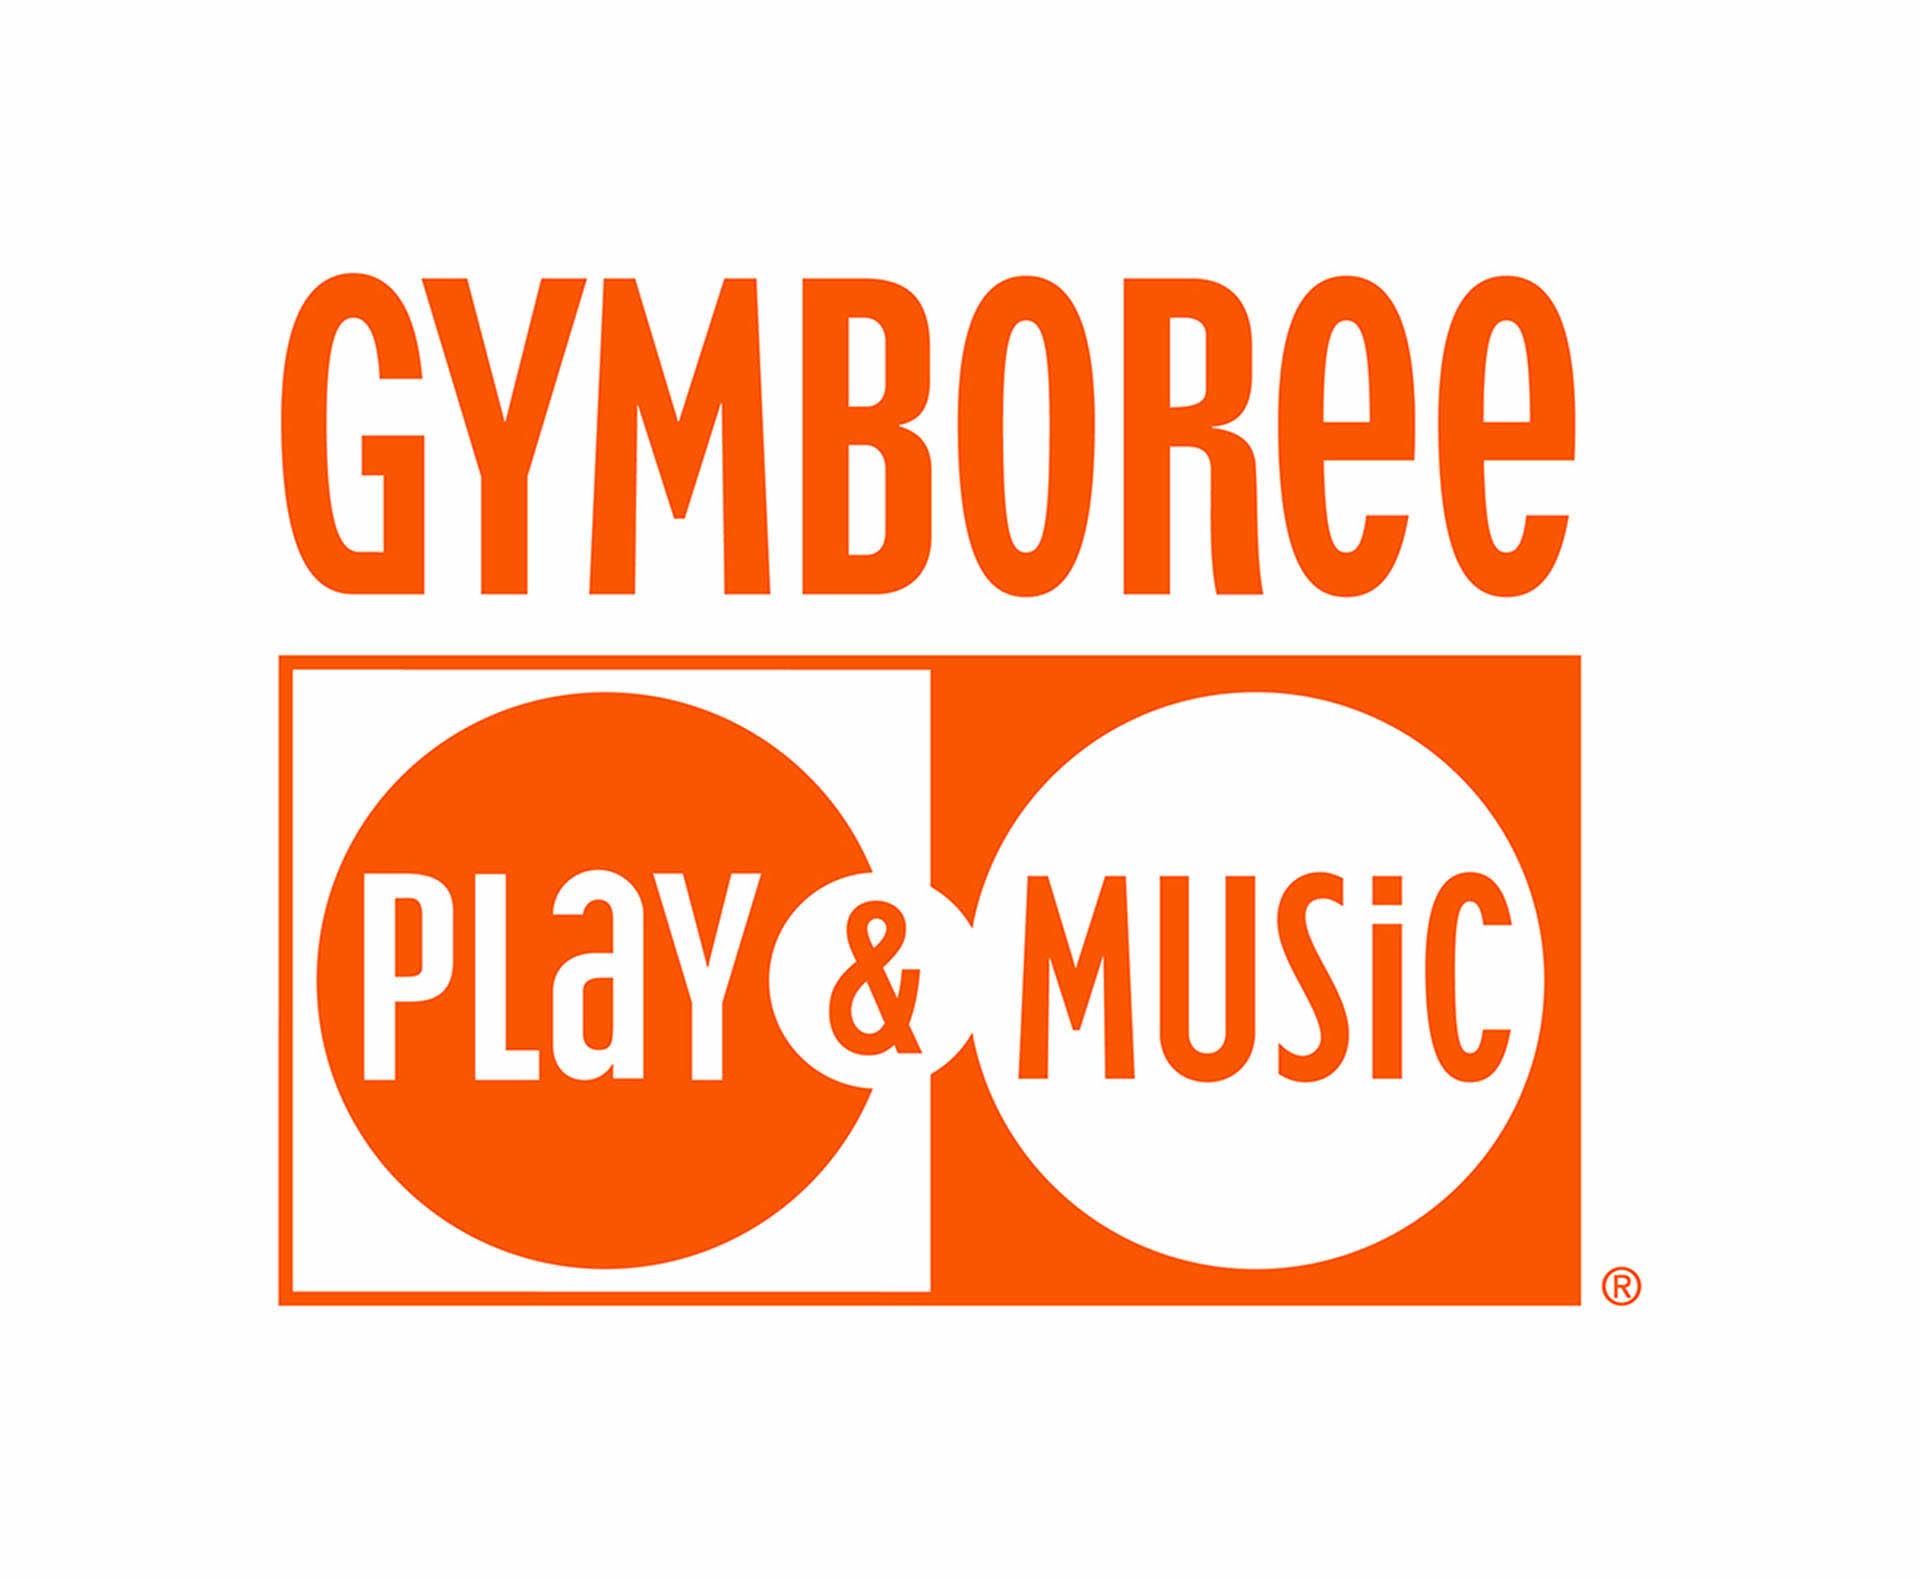 Gymboree Play & Music's logo